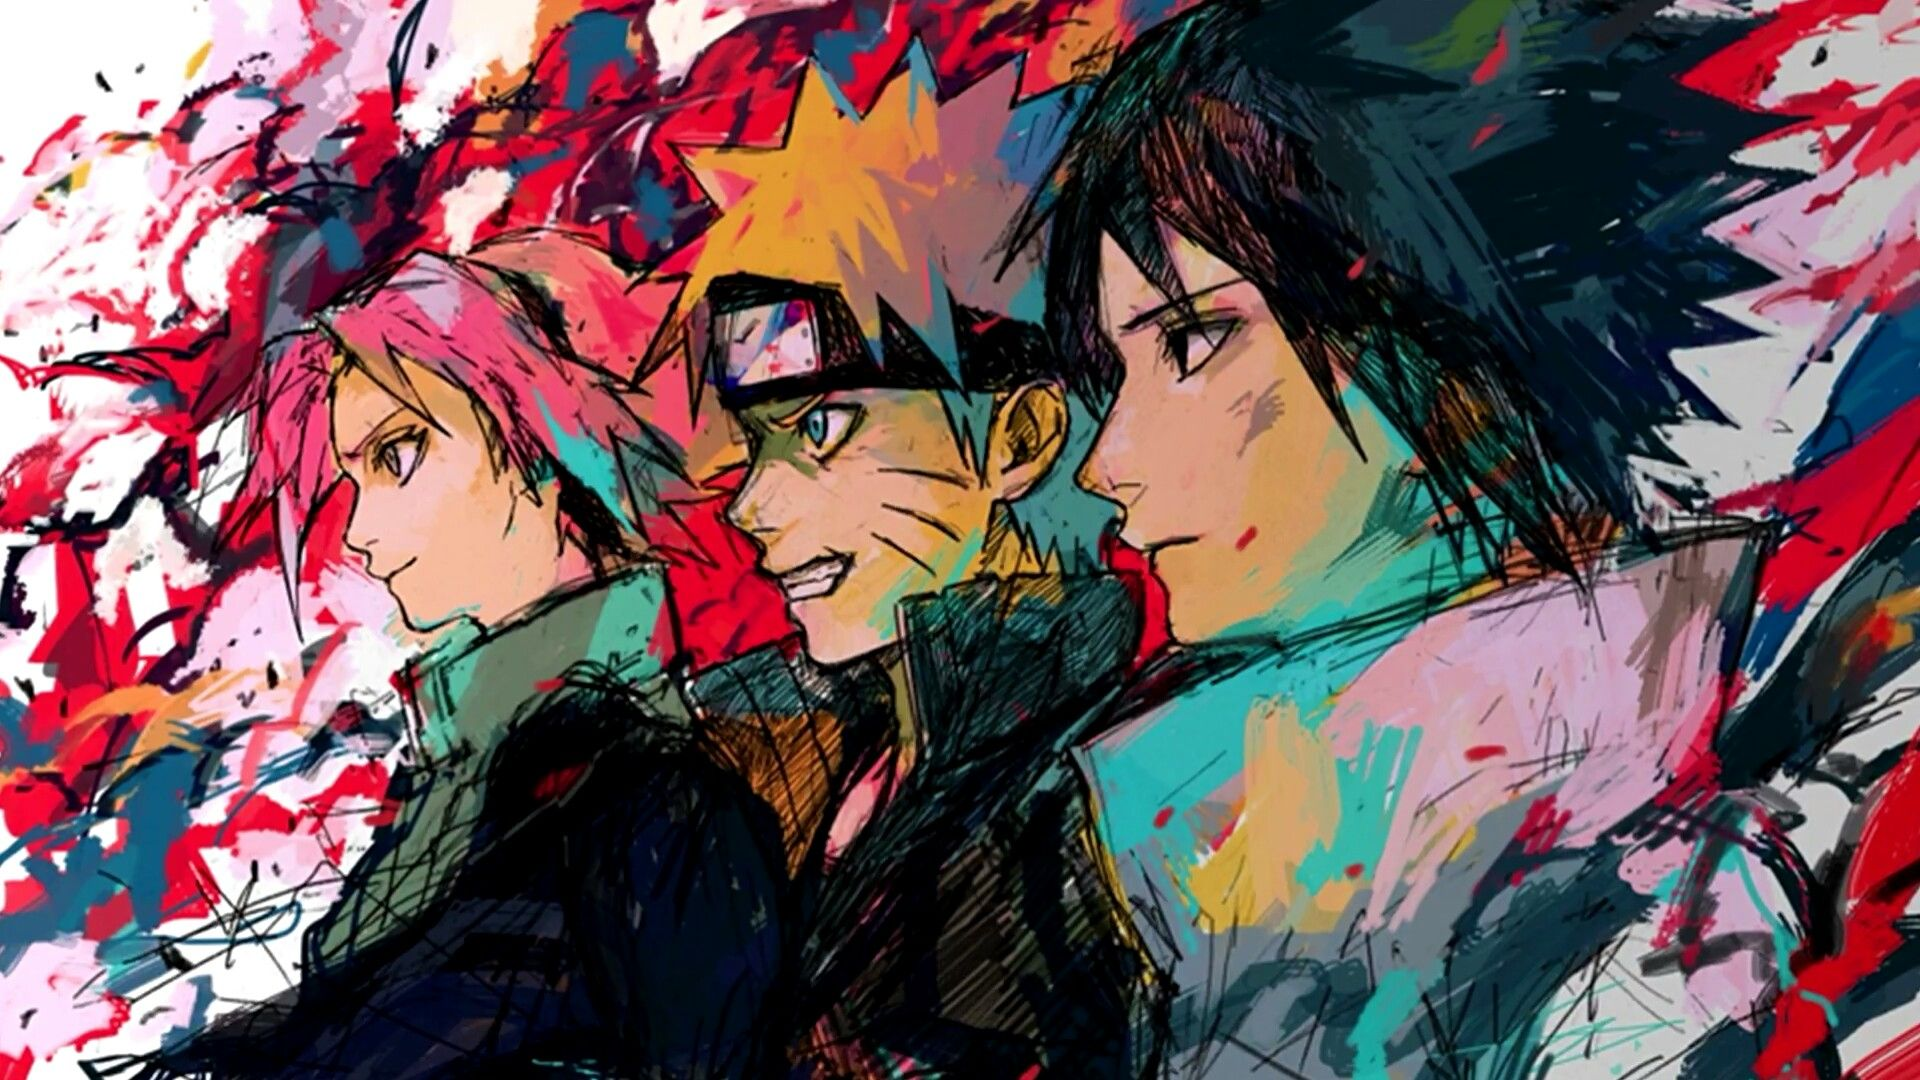 Naruto Wallpaper Wallpaper Studio 10 Tens of thousands